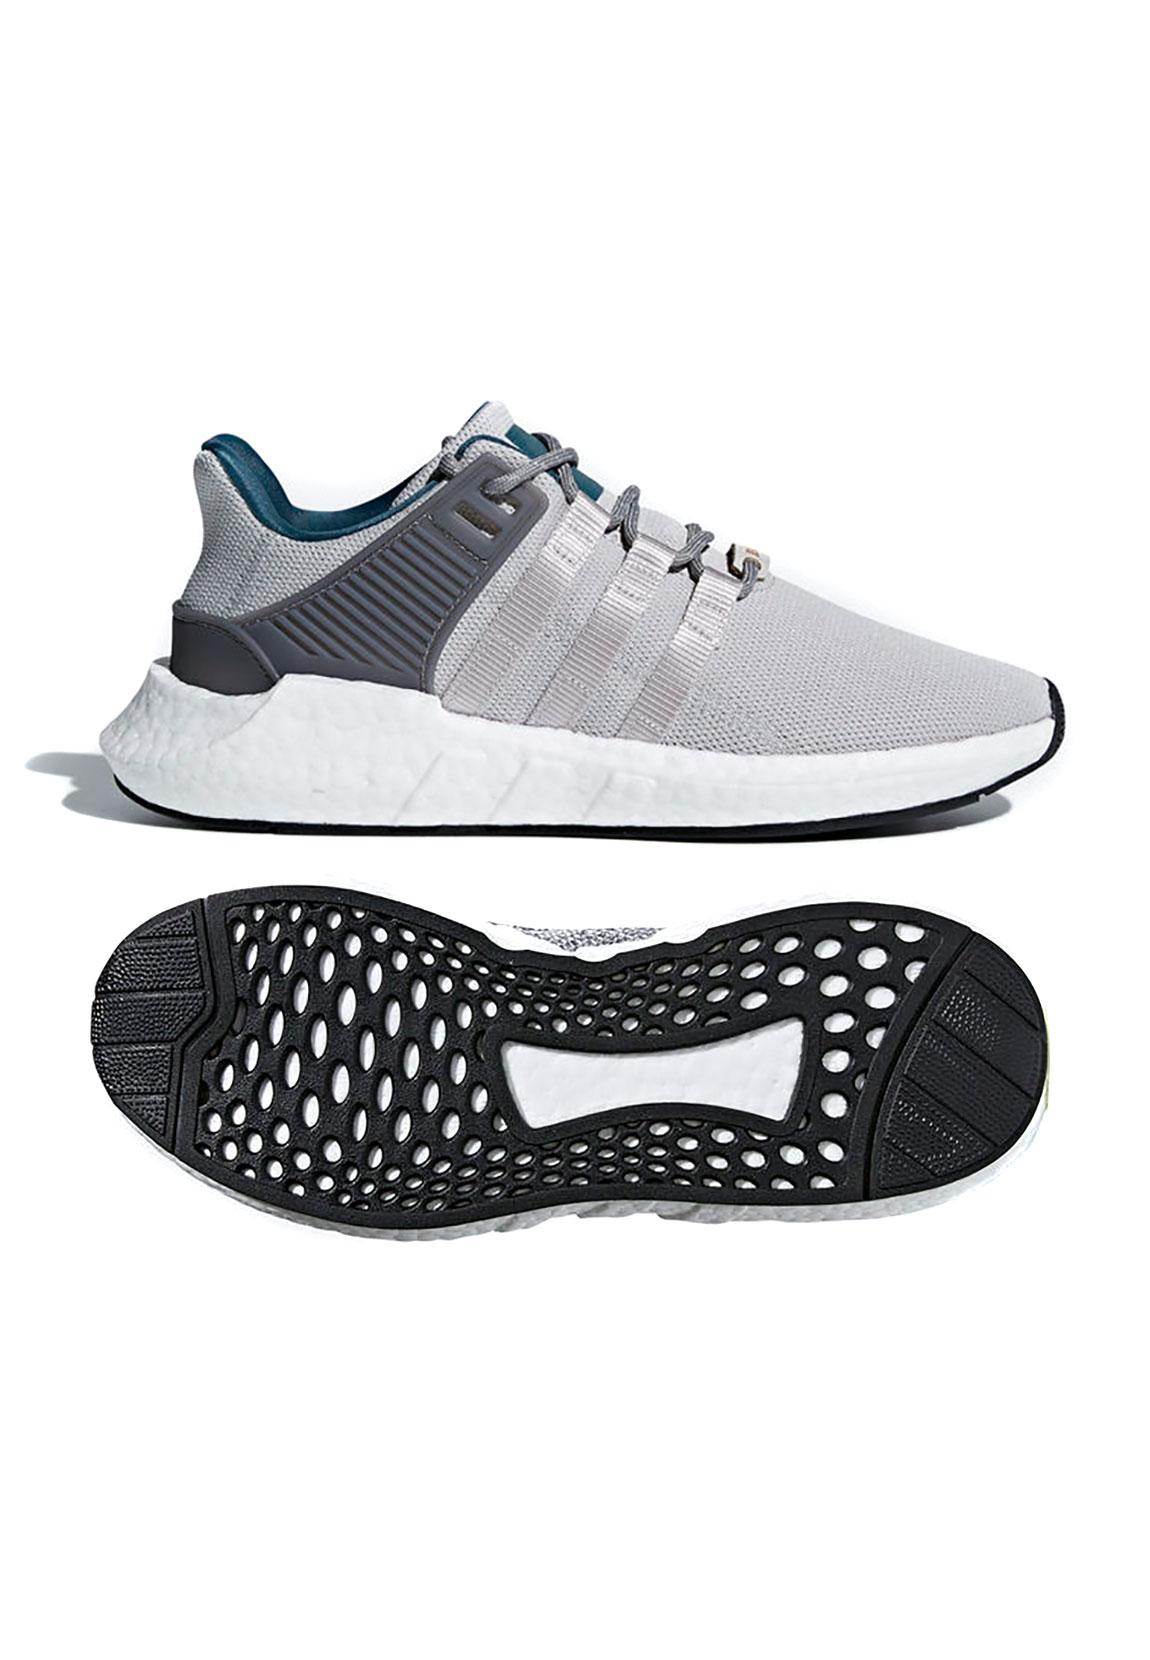 adidas sneaker eqt support cq2395 grau wei schuhe herren. Black Bedroom Furniture Sets. Home Design Ideas